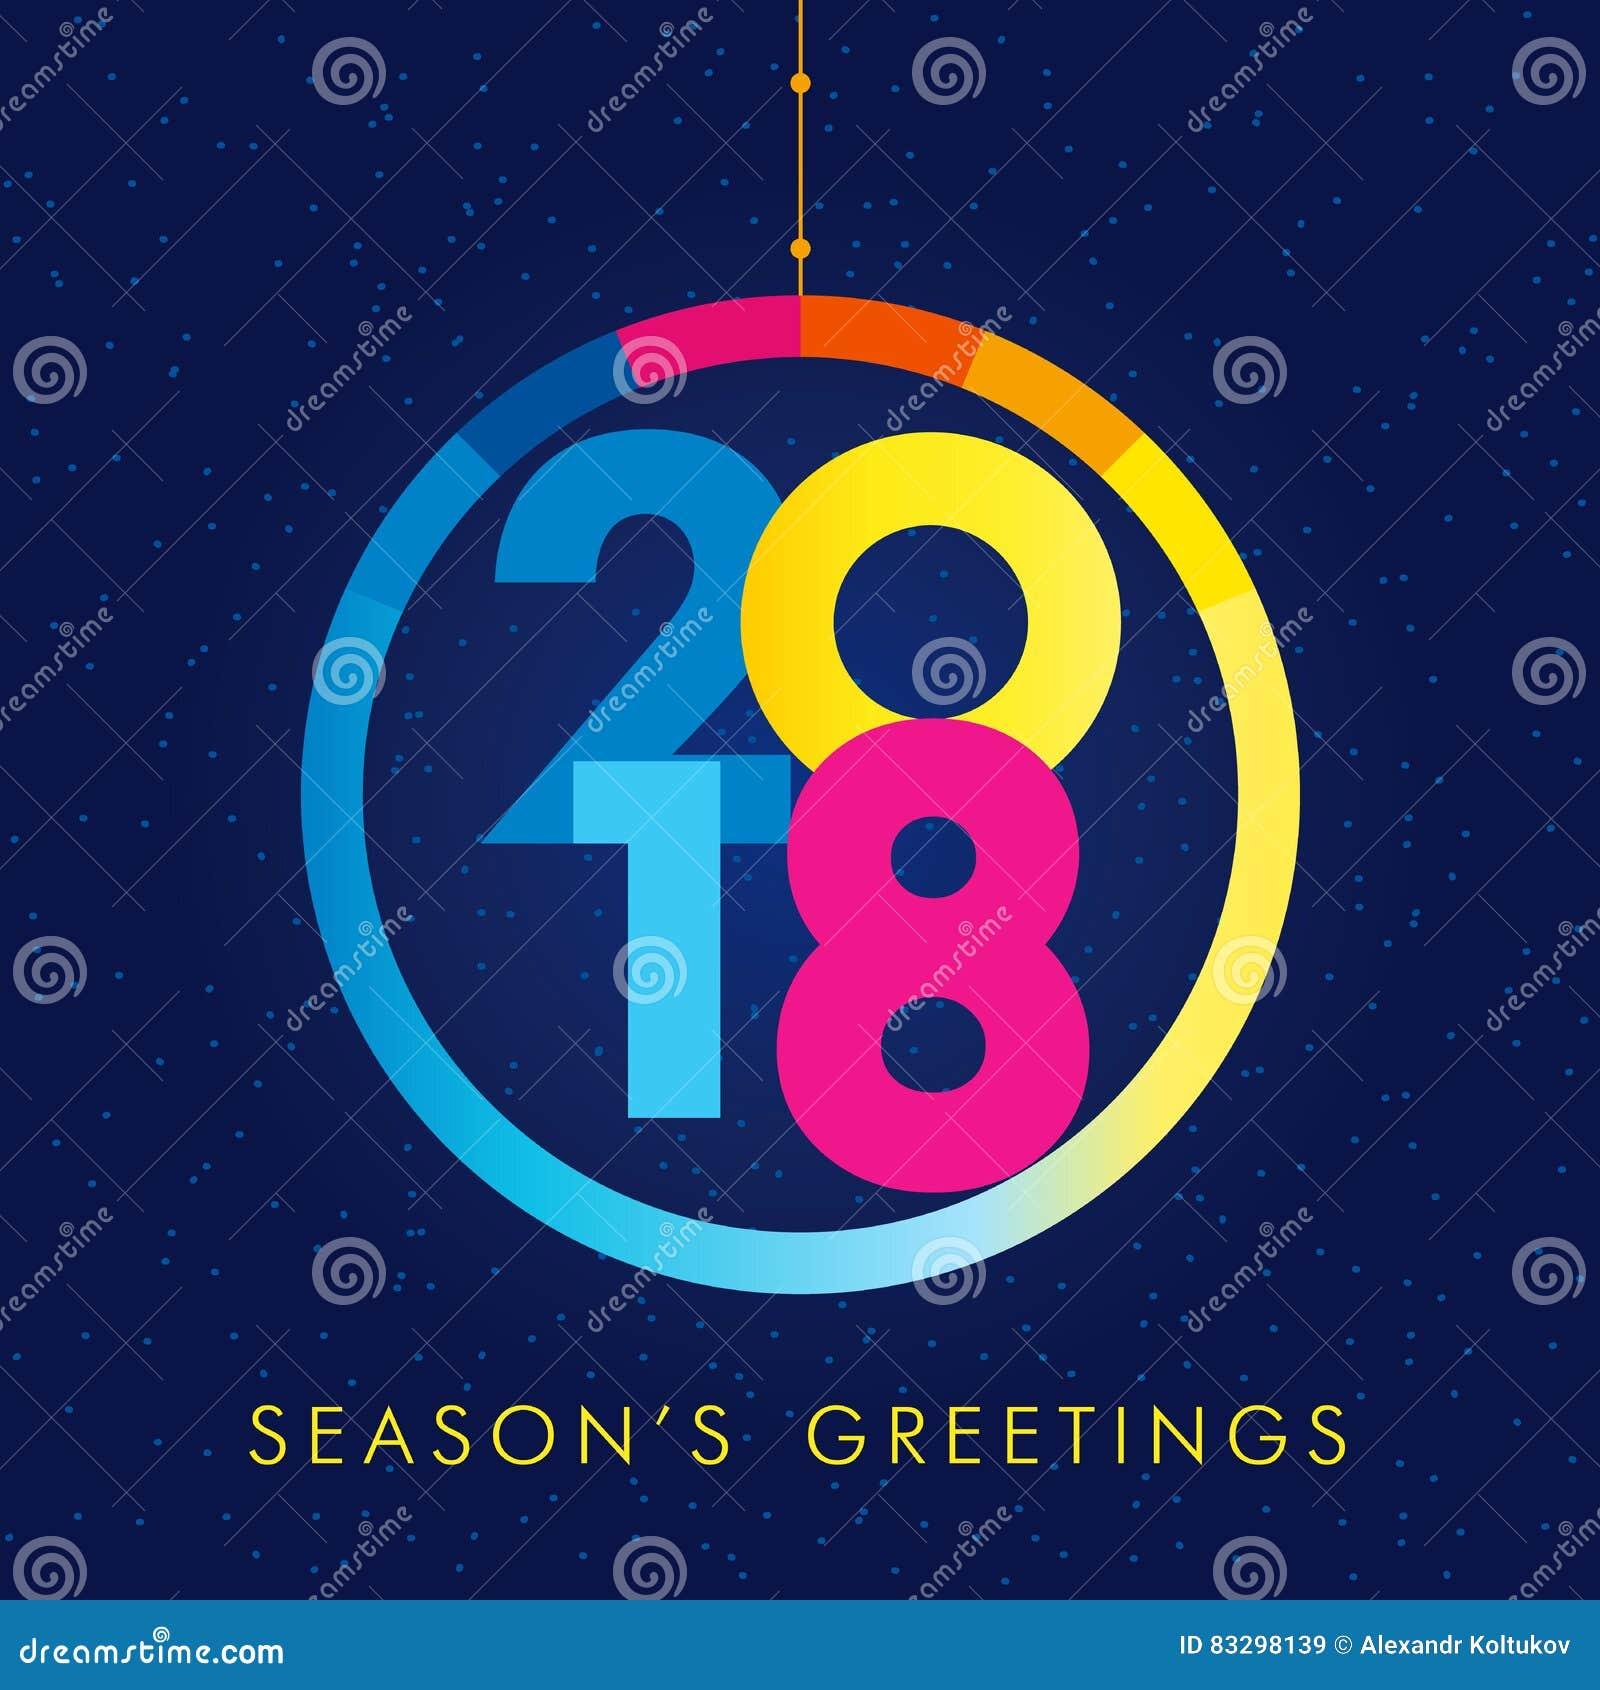 2018 Seasons Greetings Happy New Year Card Stock Vector